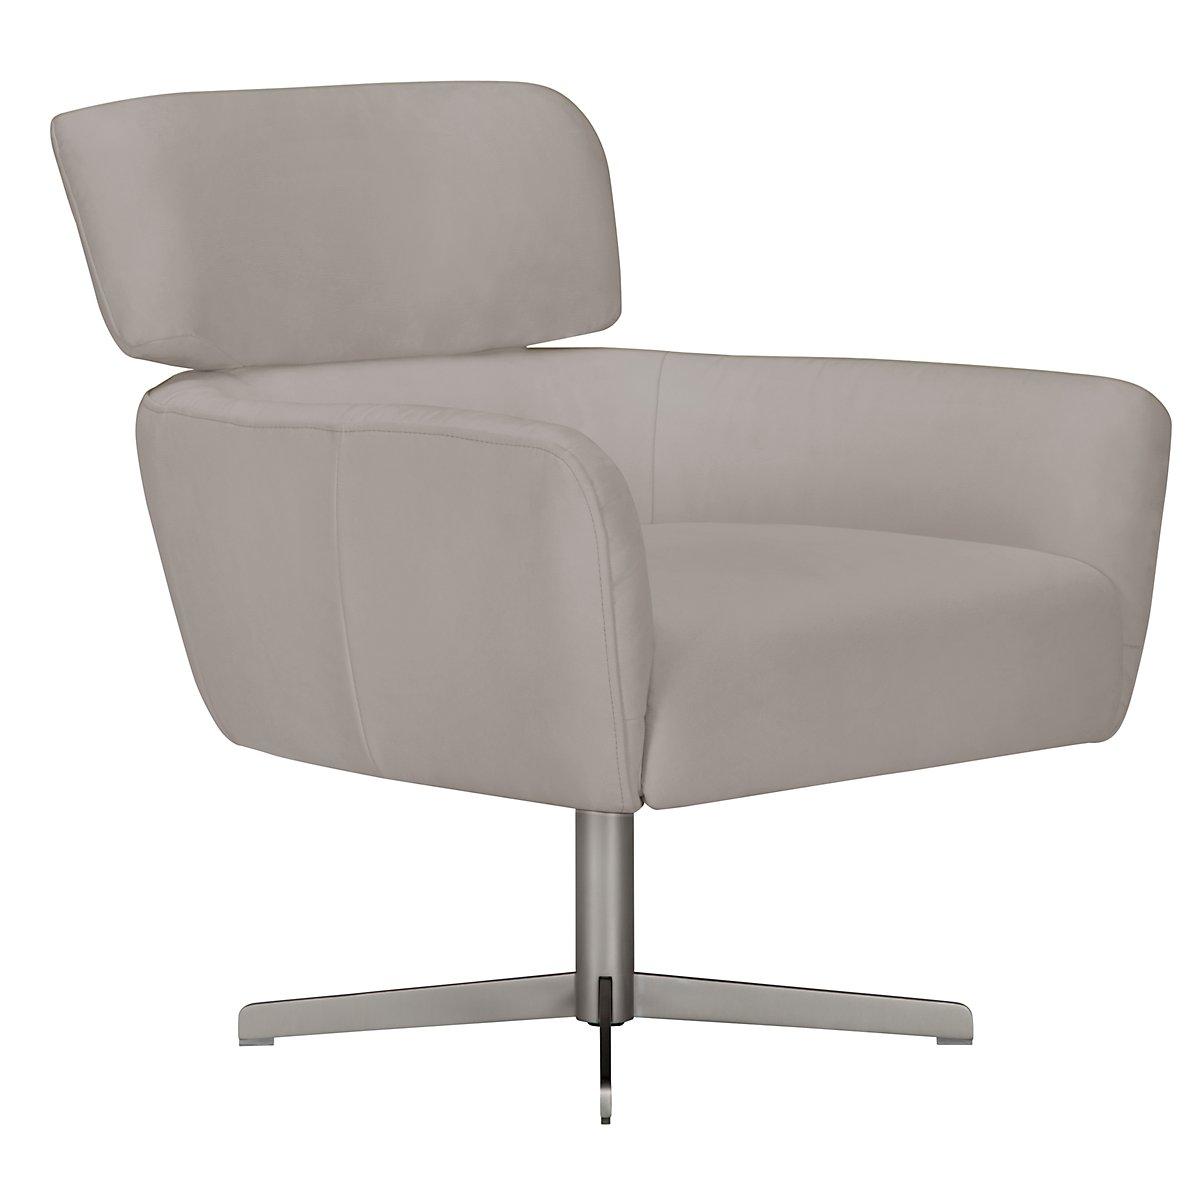 City Furniture Wynn Lt Gray Microfiber Swivel Accent Chair